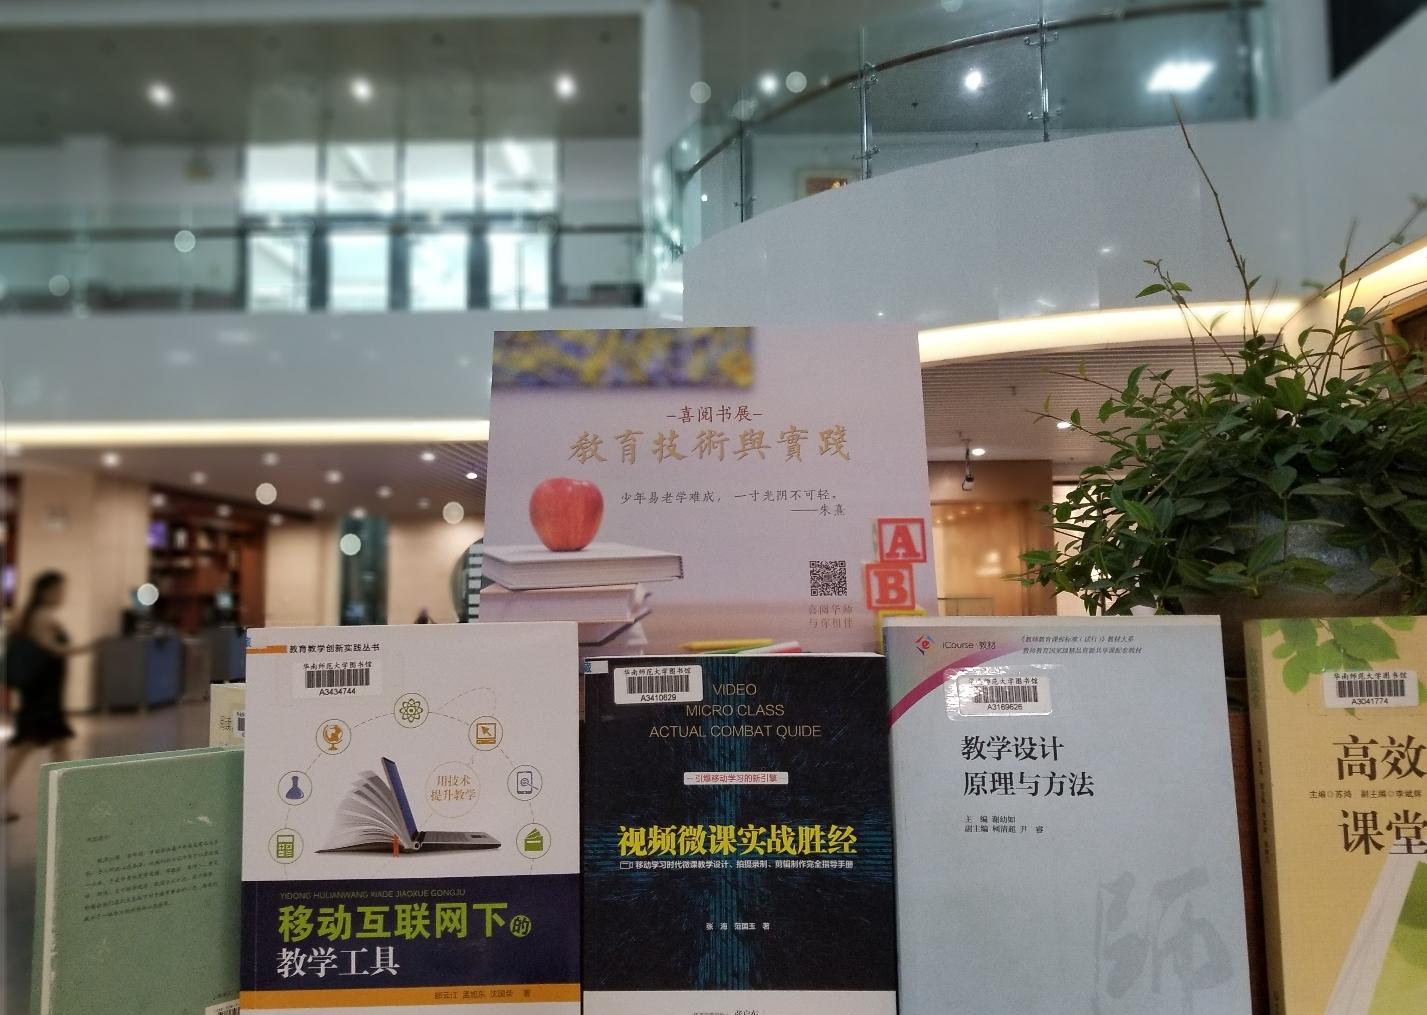 SmartSelect_20190611-110018_Gallery.jpg